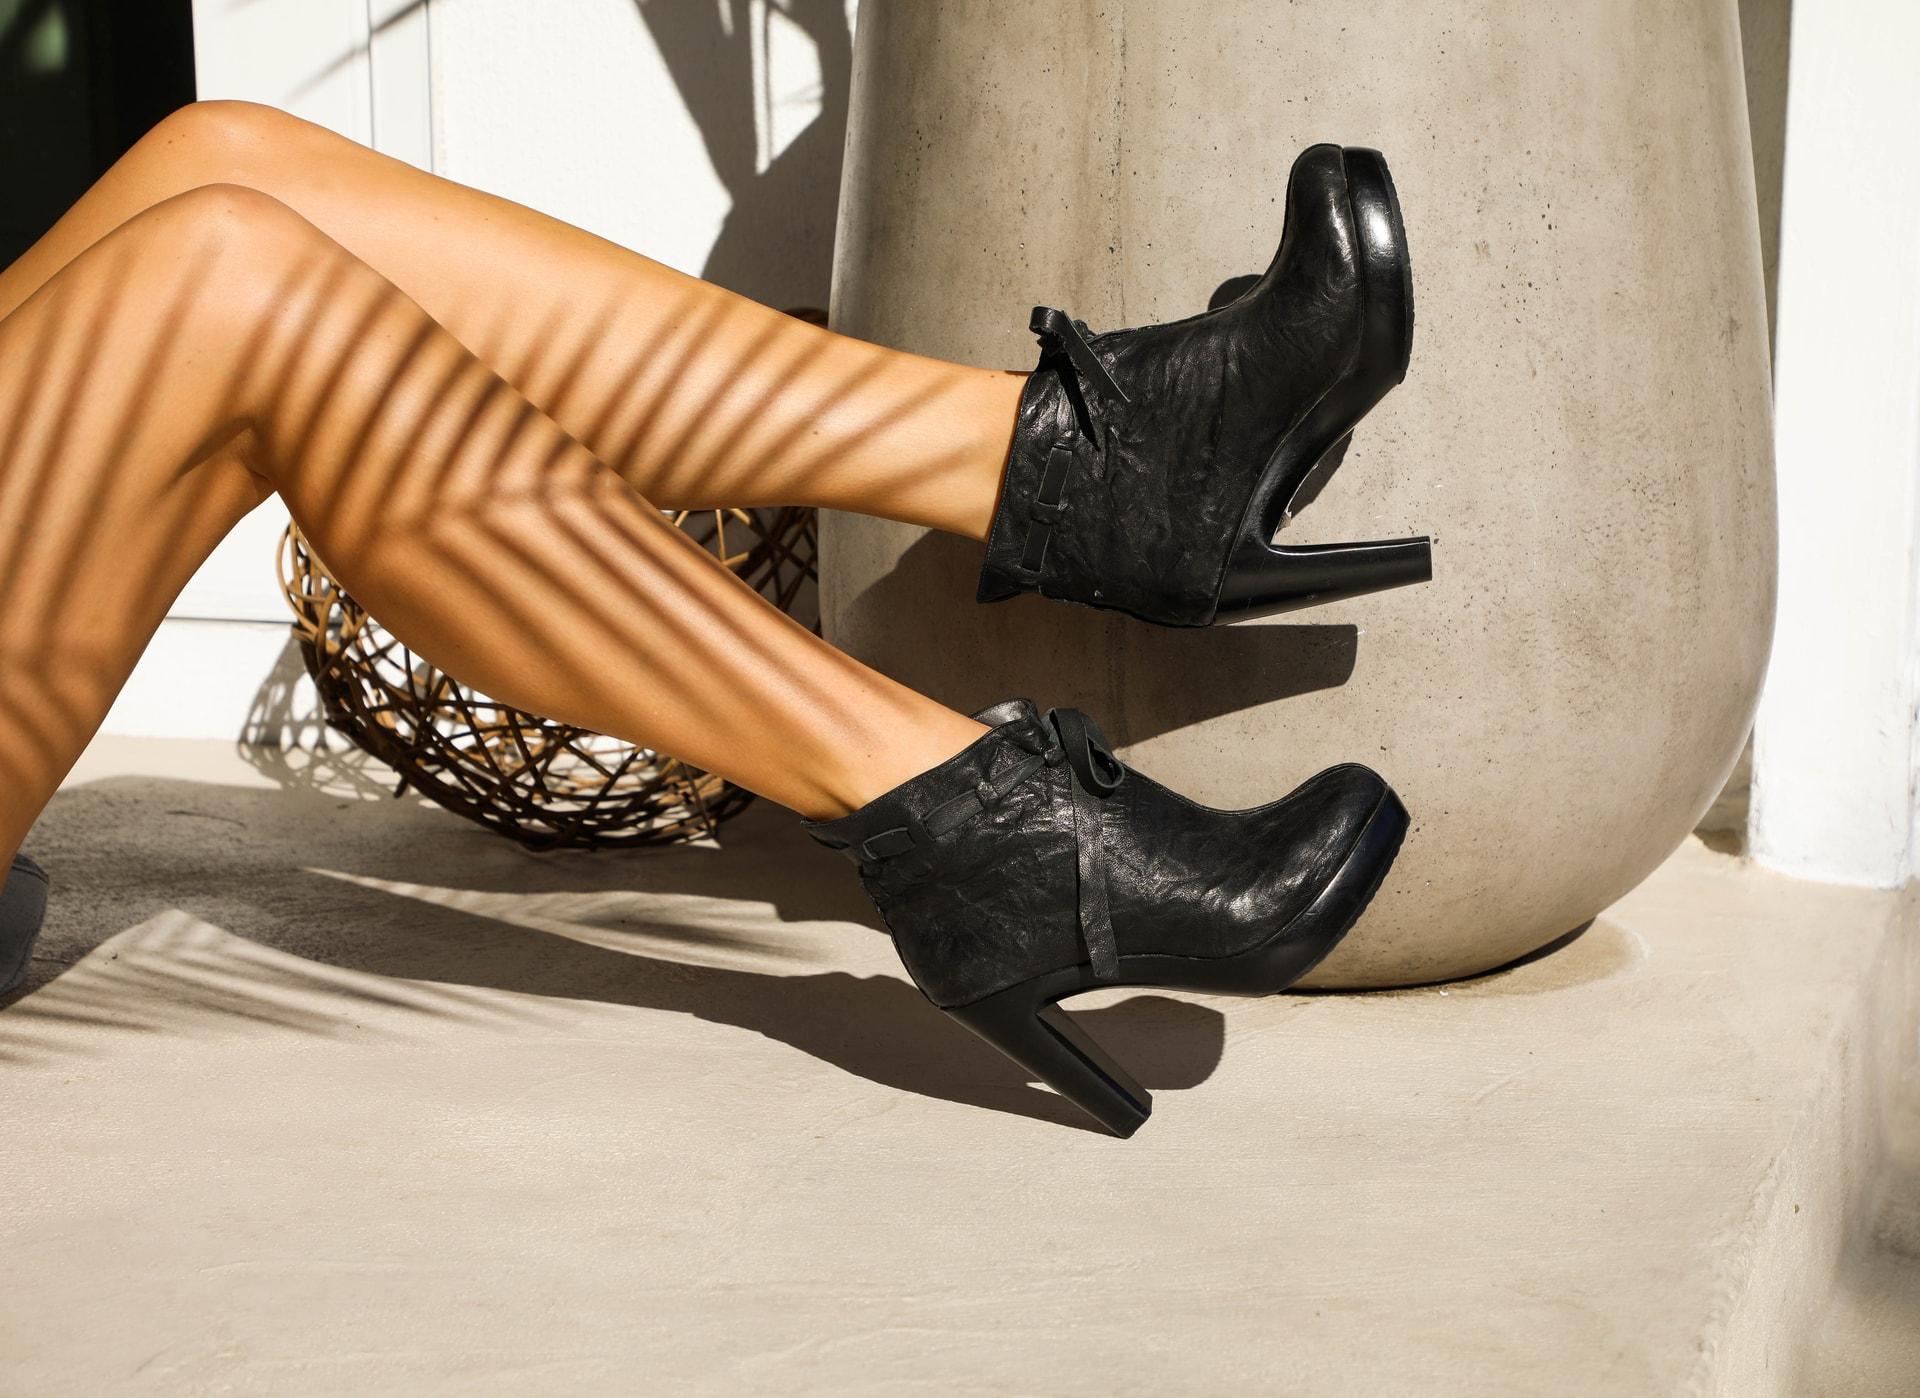 Salpy Shoes